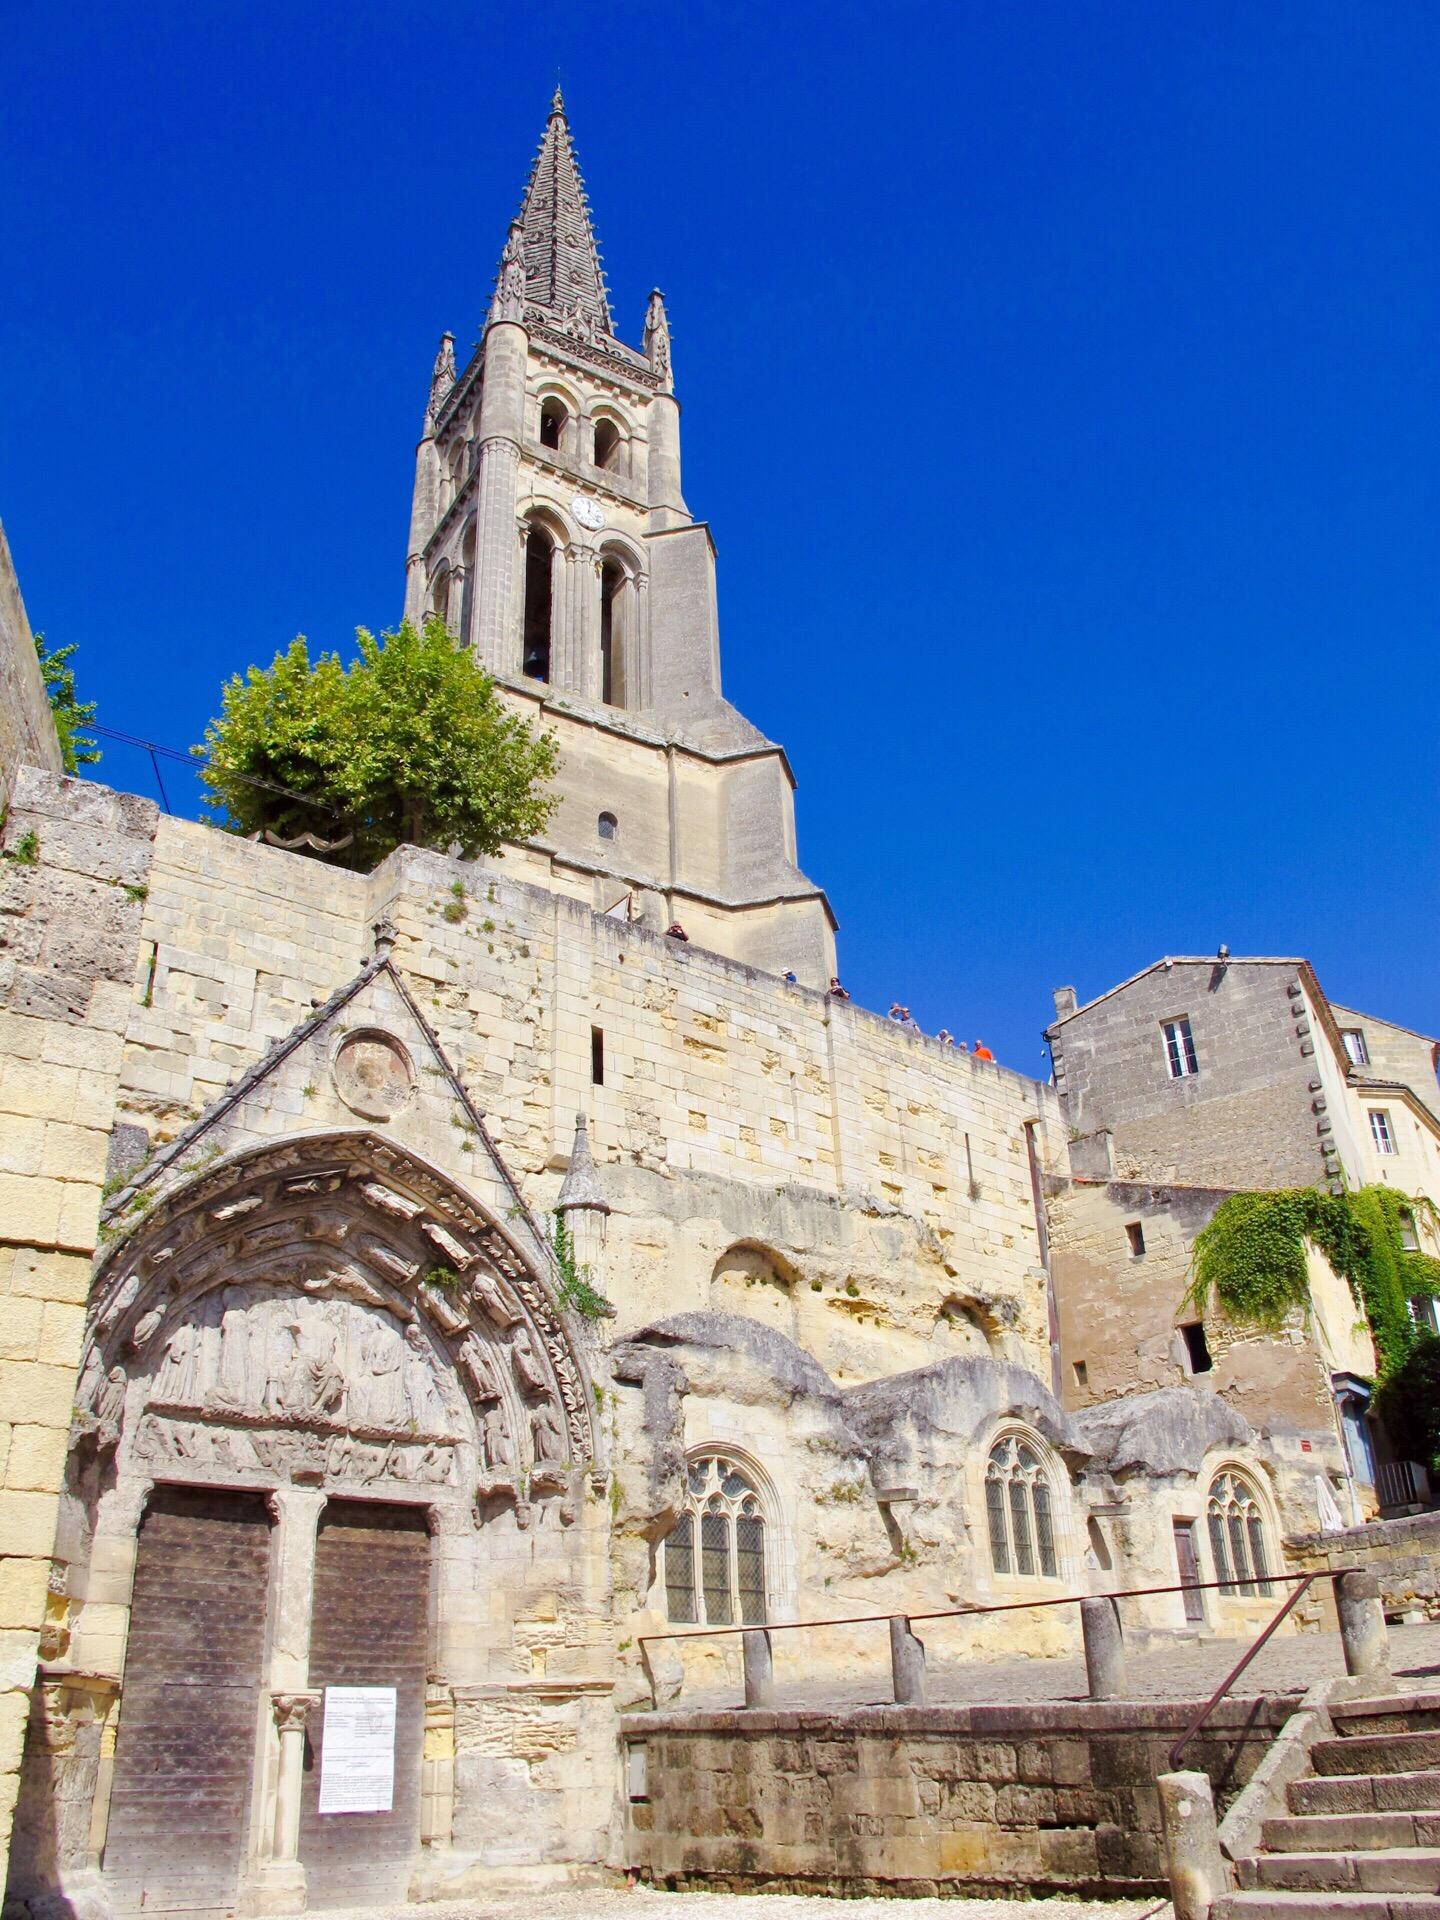 Saint-Emilion Monolithic Church